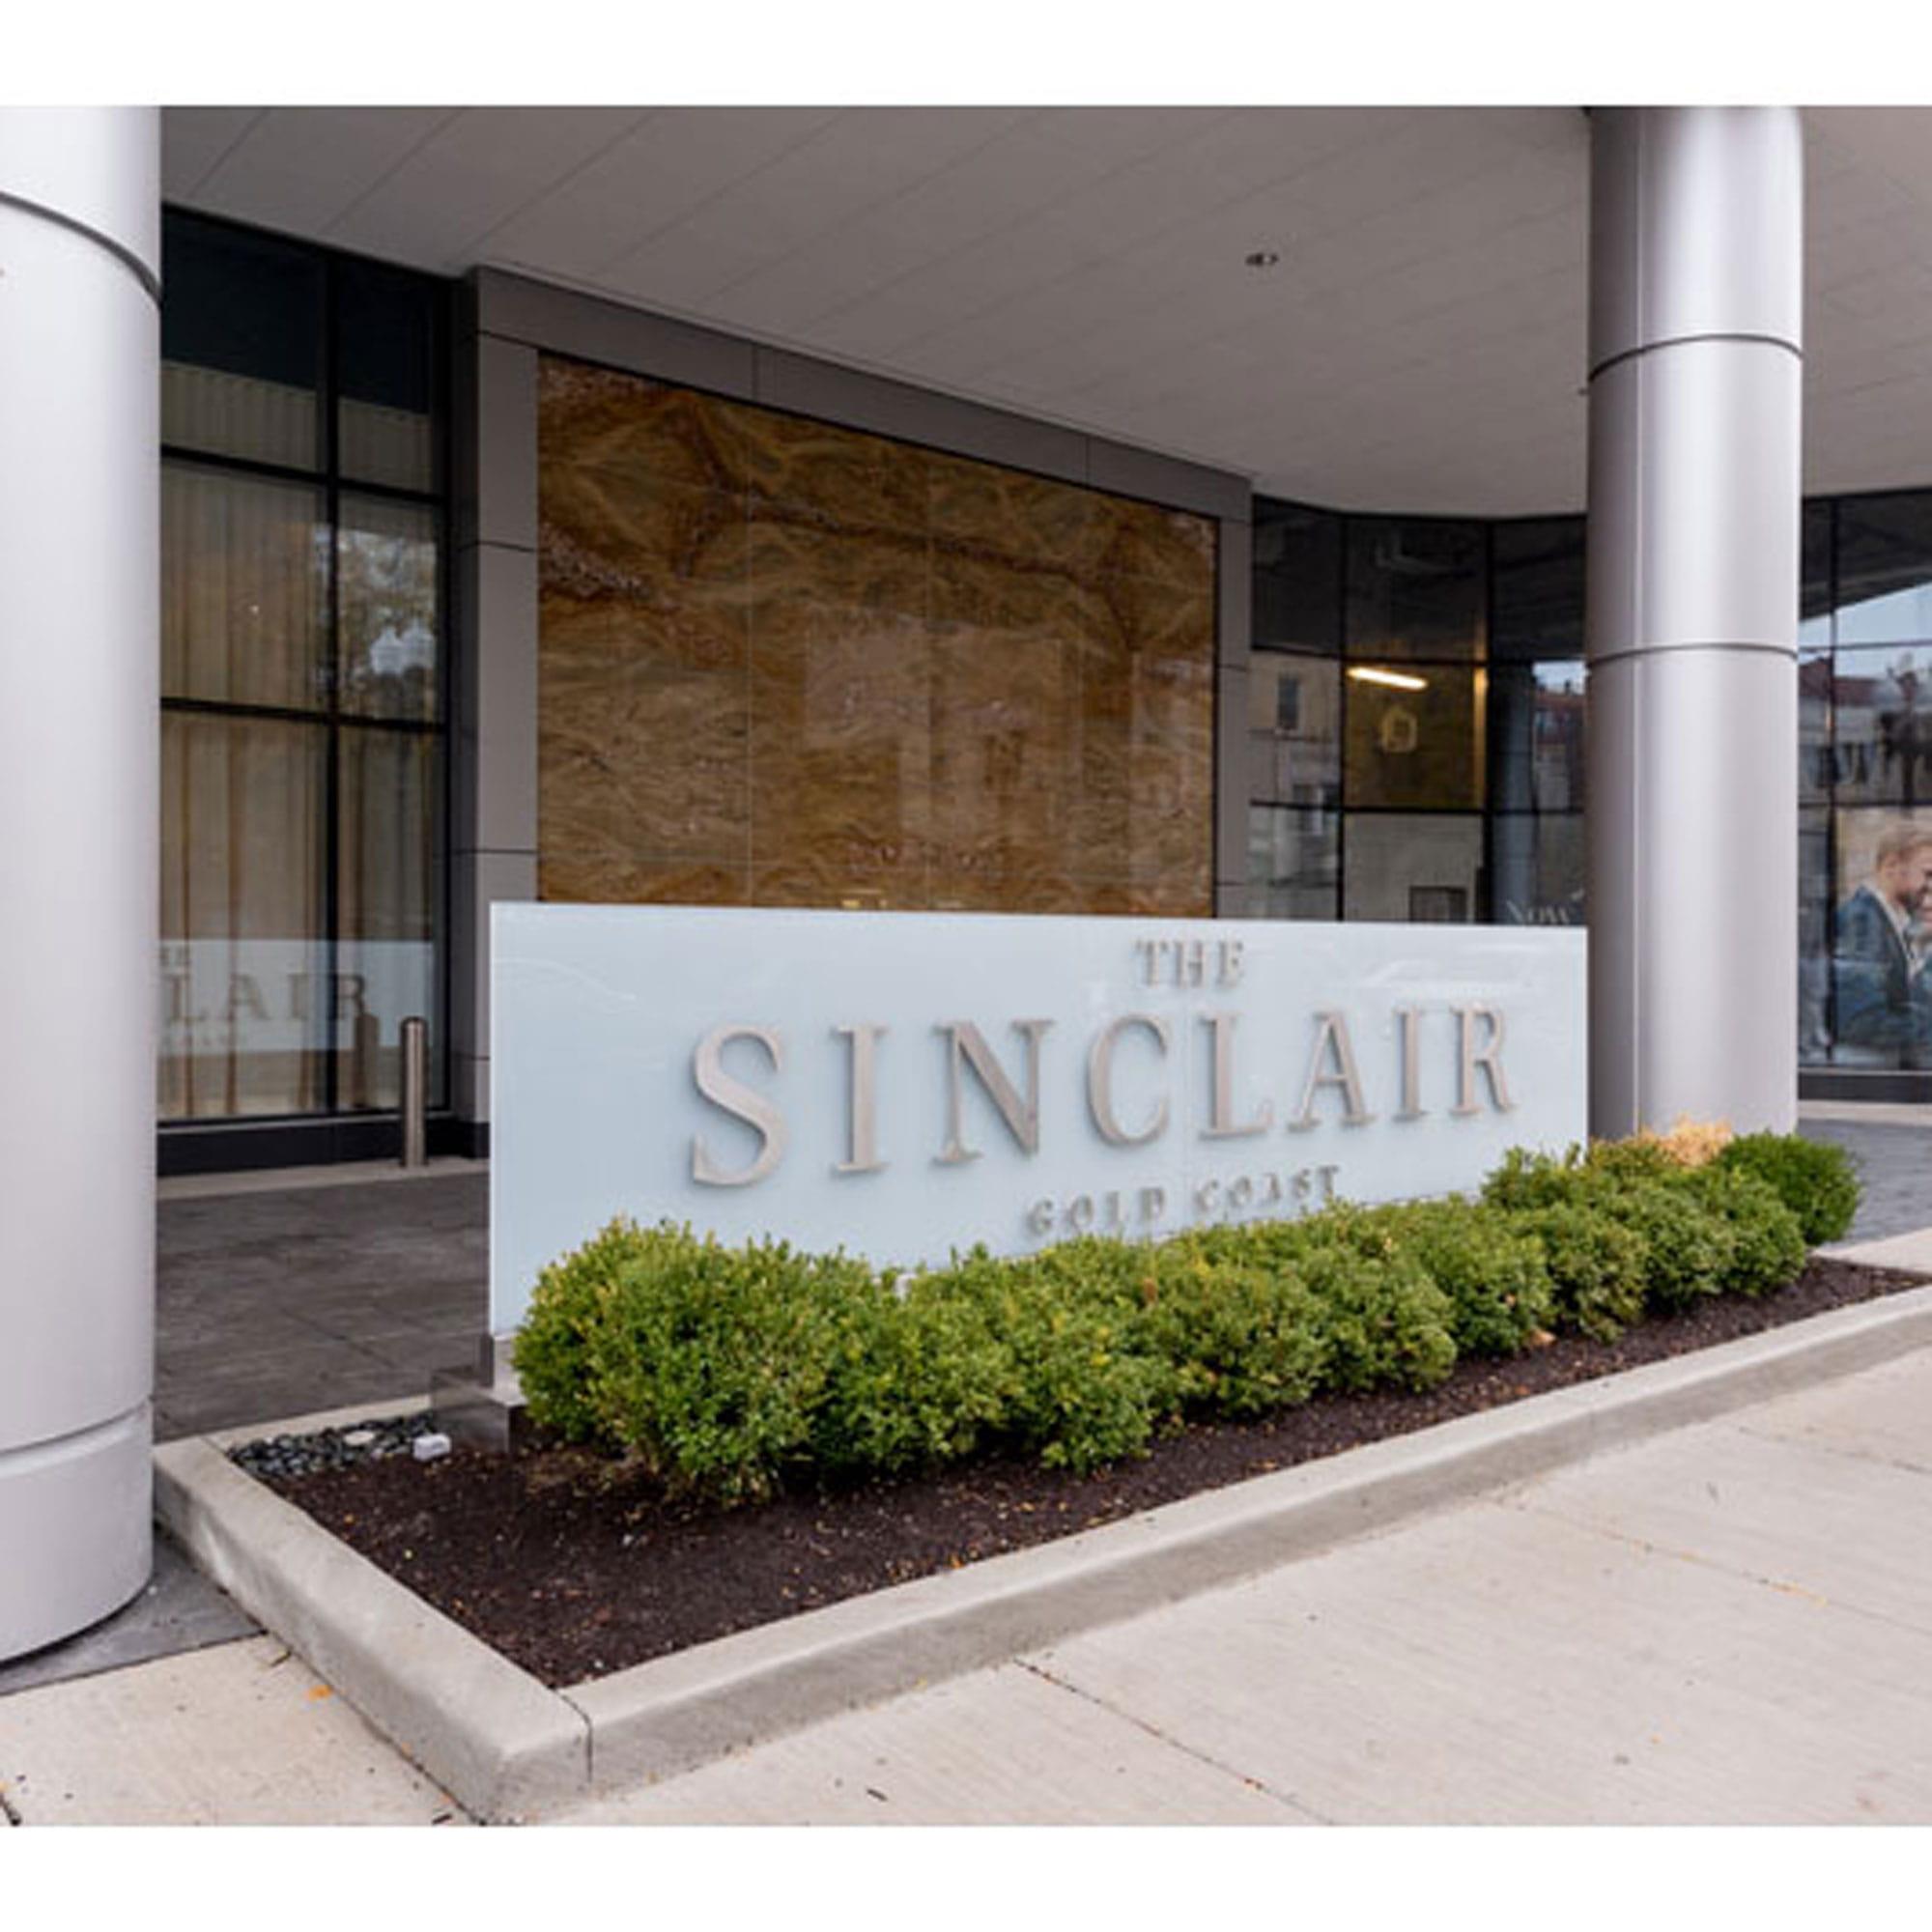 Sinclair signe